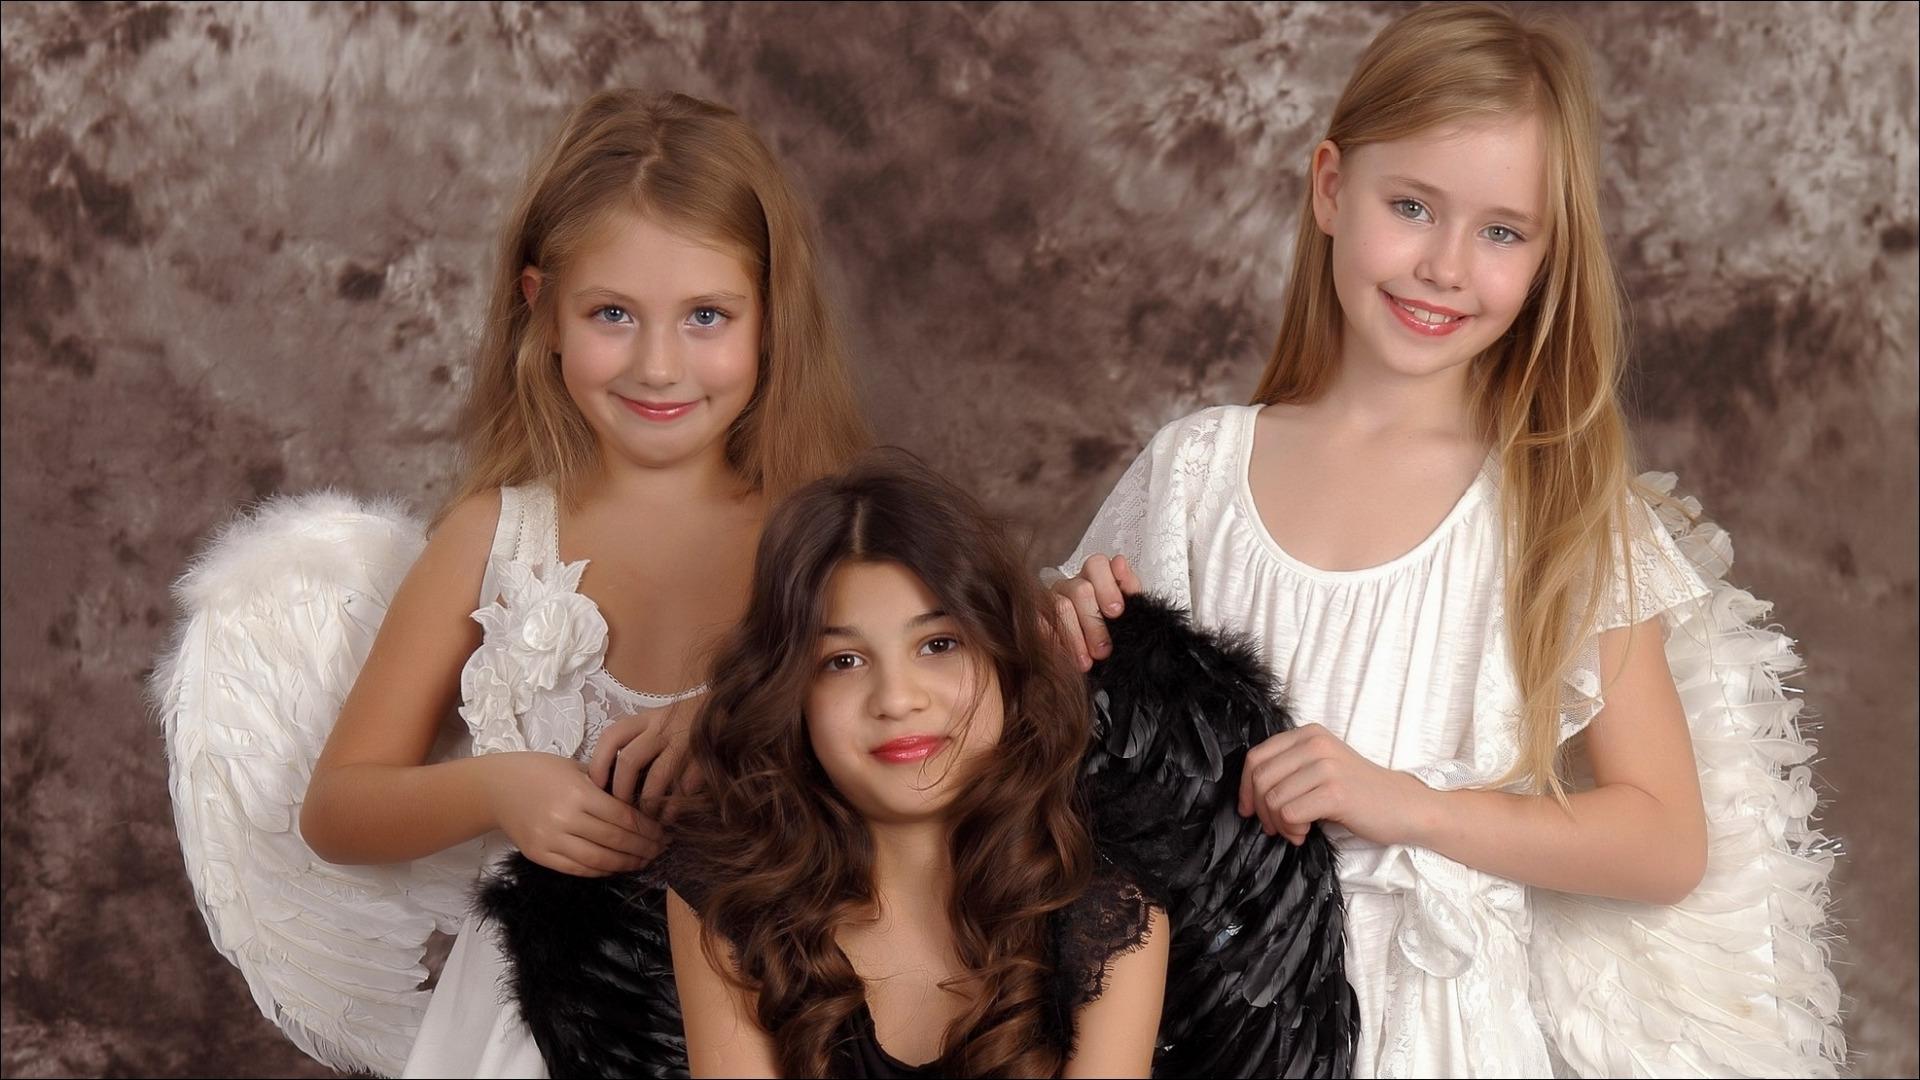 Free teen supermodel movie, ariel rebel licked